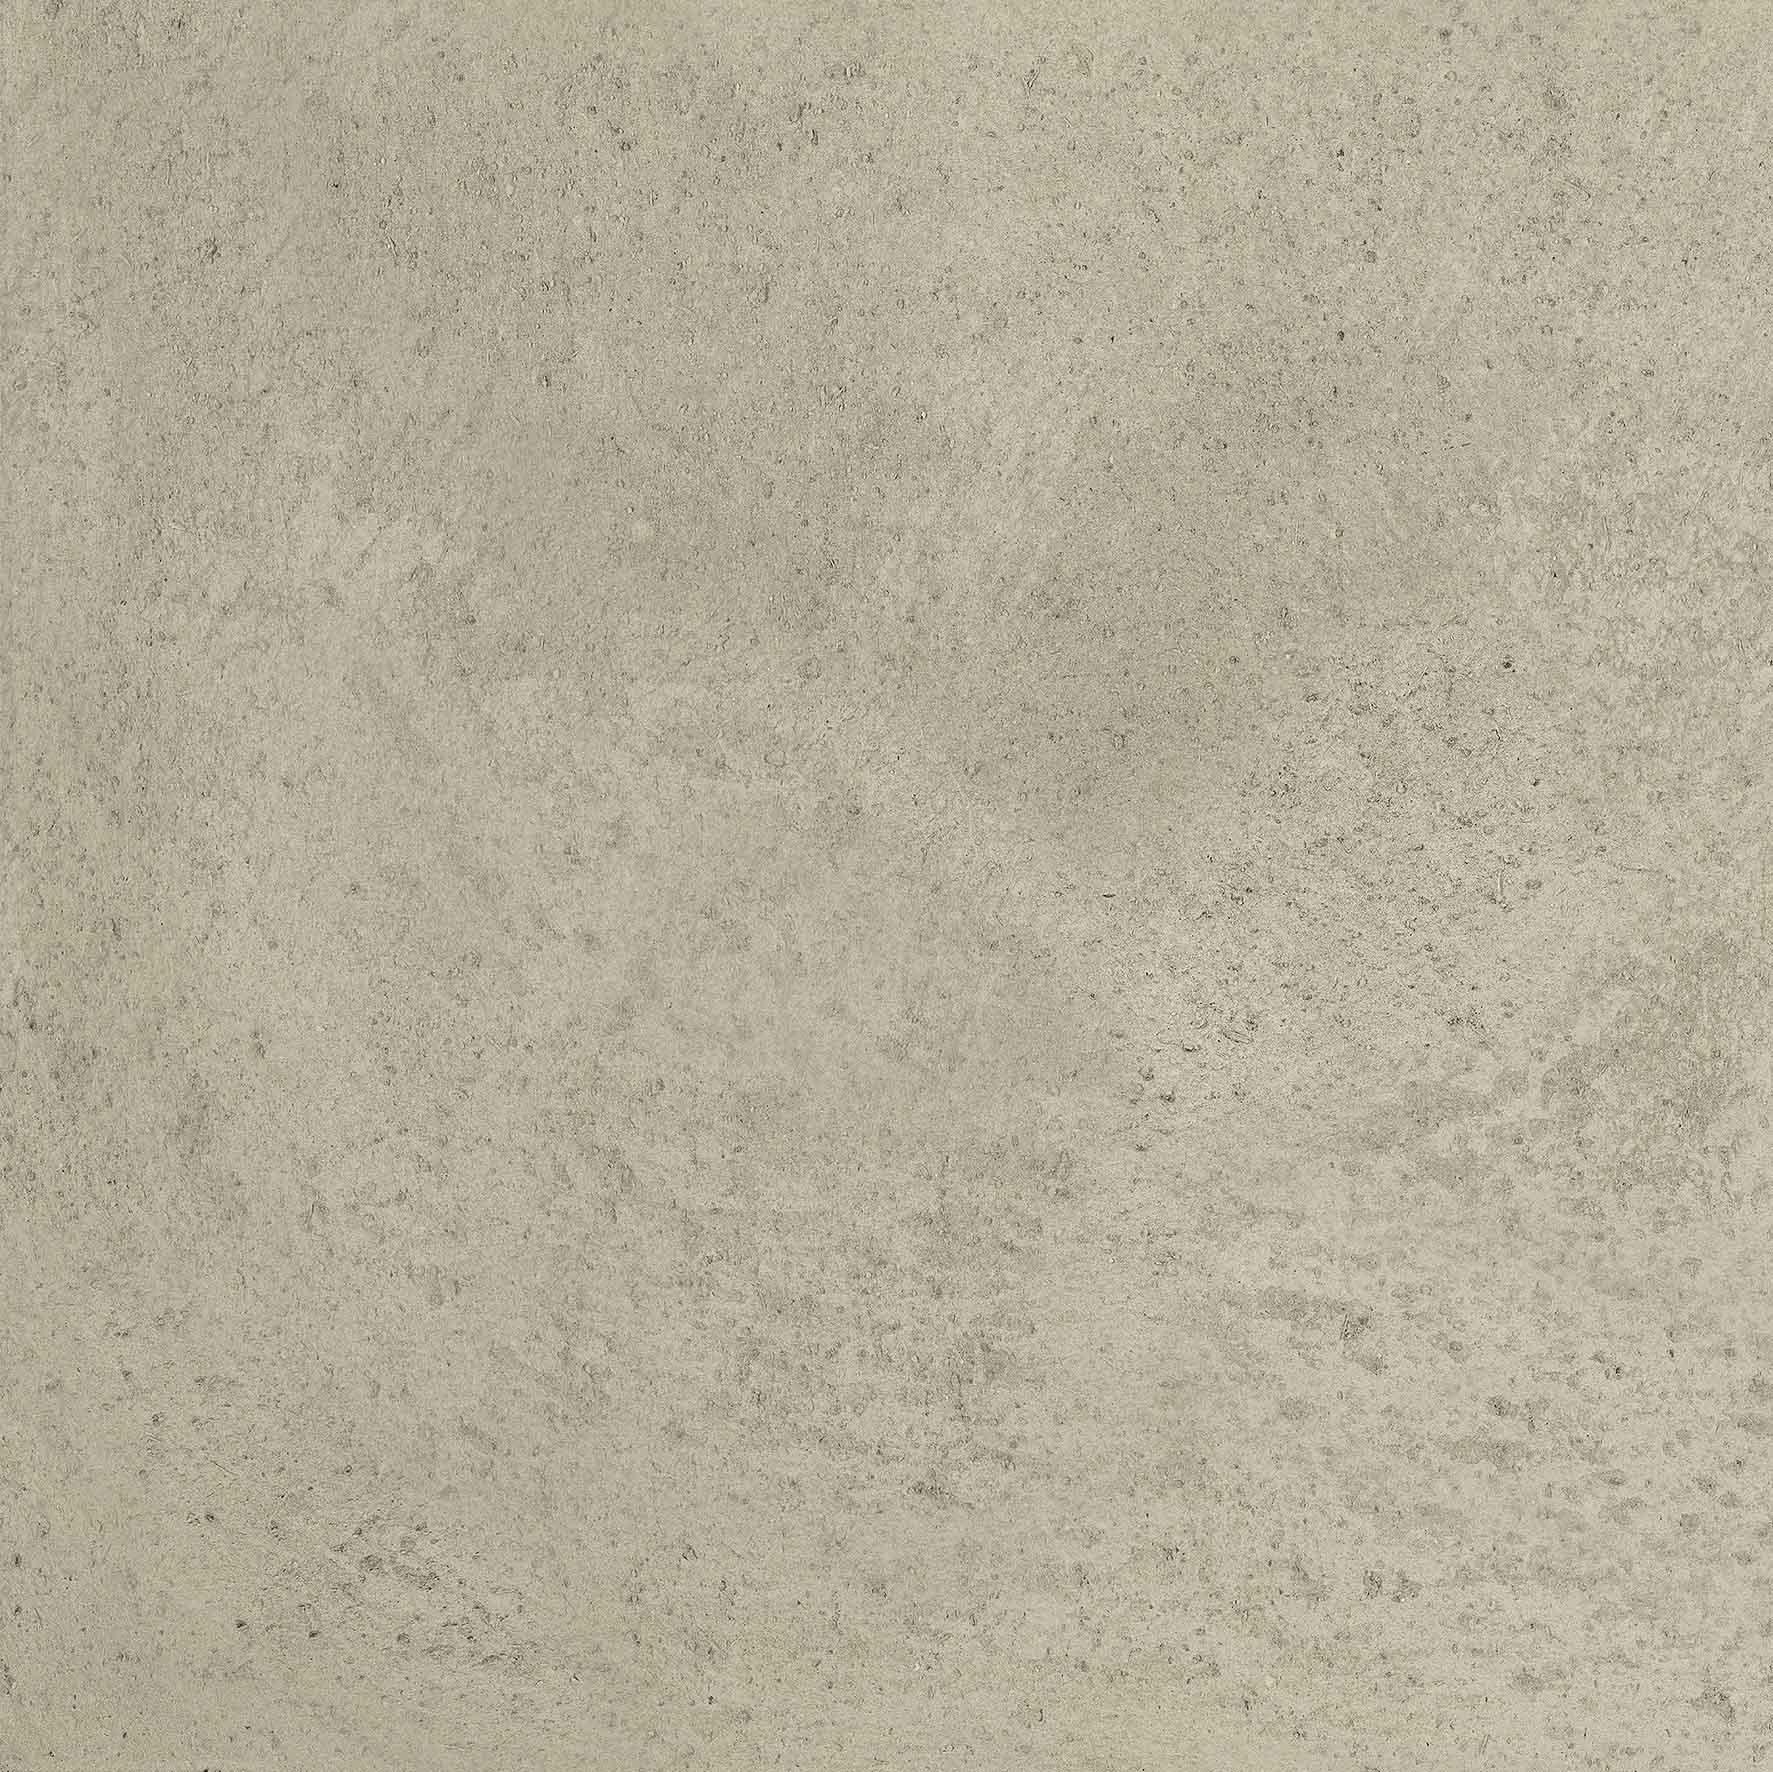 Maps of Cerim Beige Matte 10mm 60 x 60